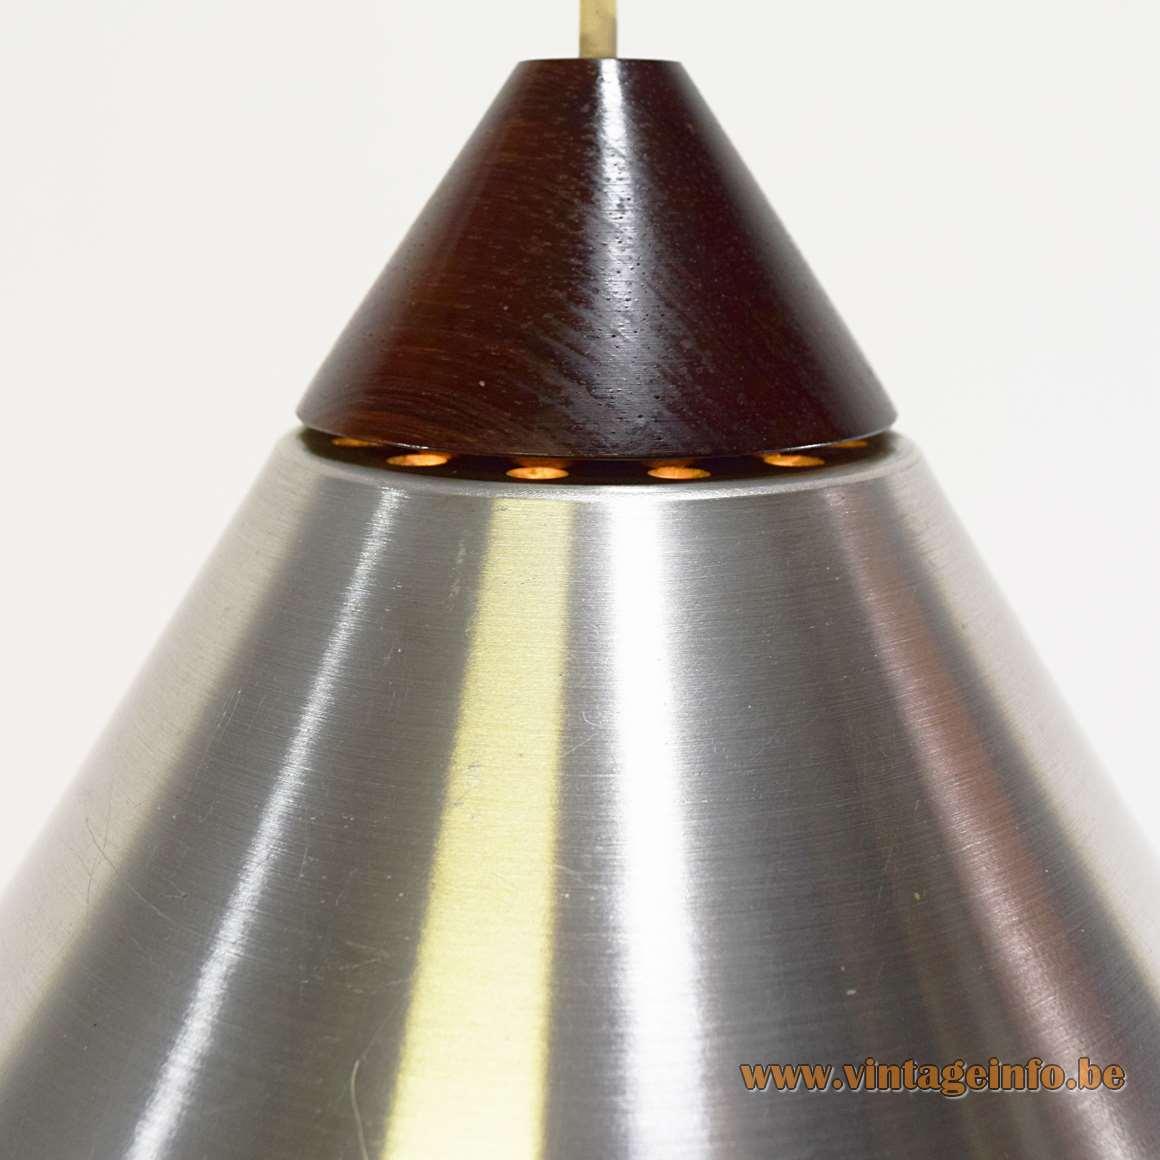 Uno & Osten Kristiansson pendant lamp conical brushed aluminium lampshade wood top Luxus Sweden 1960s